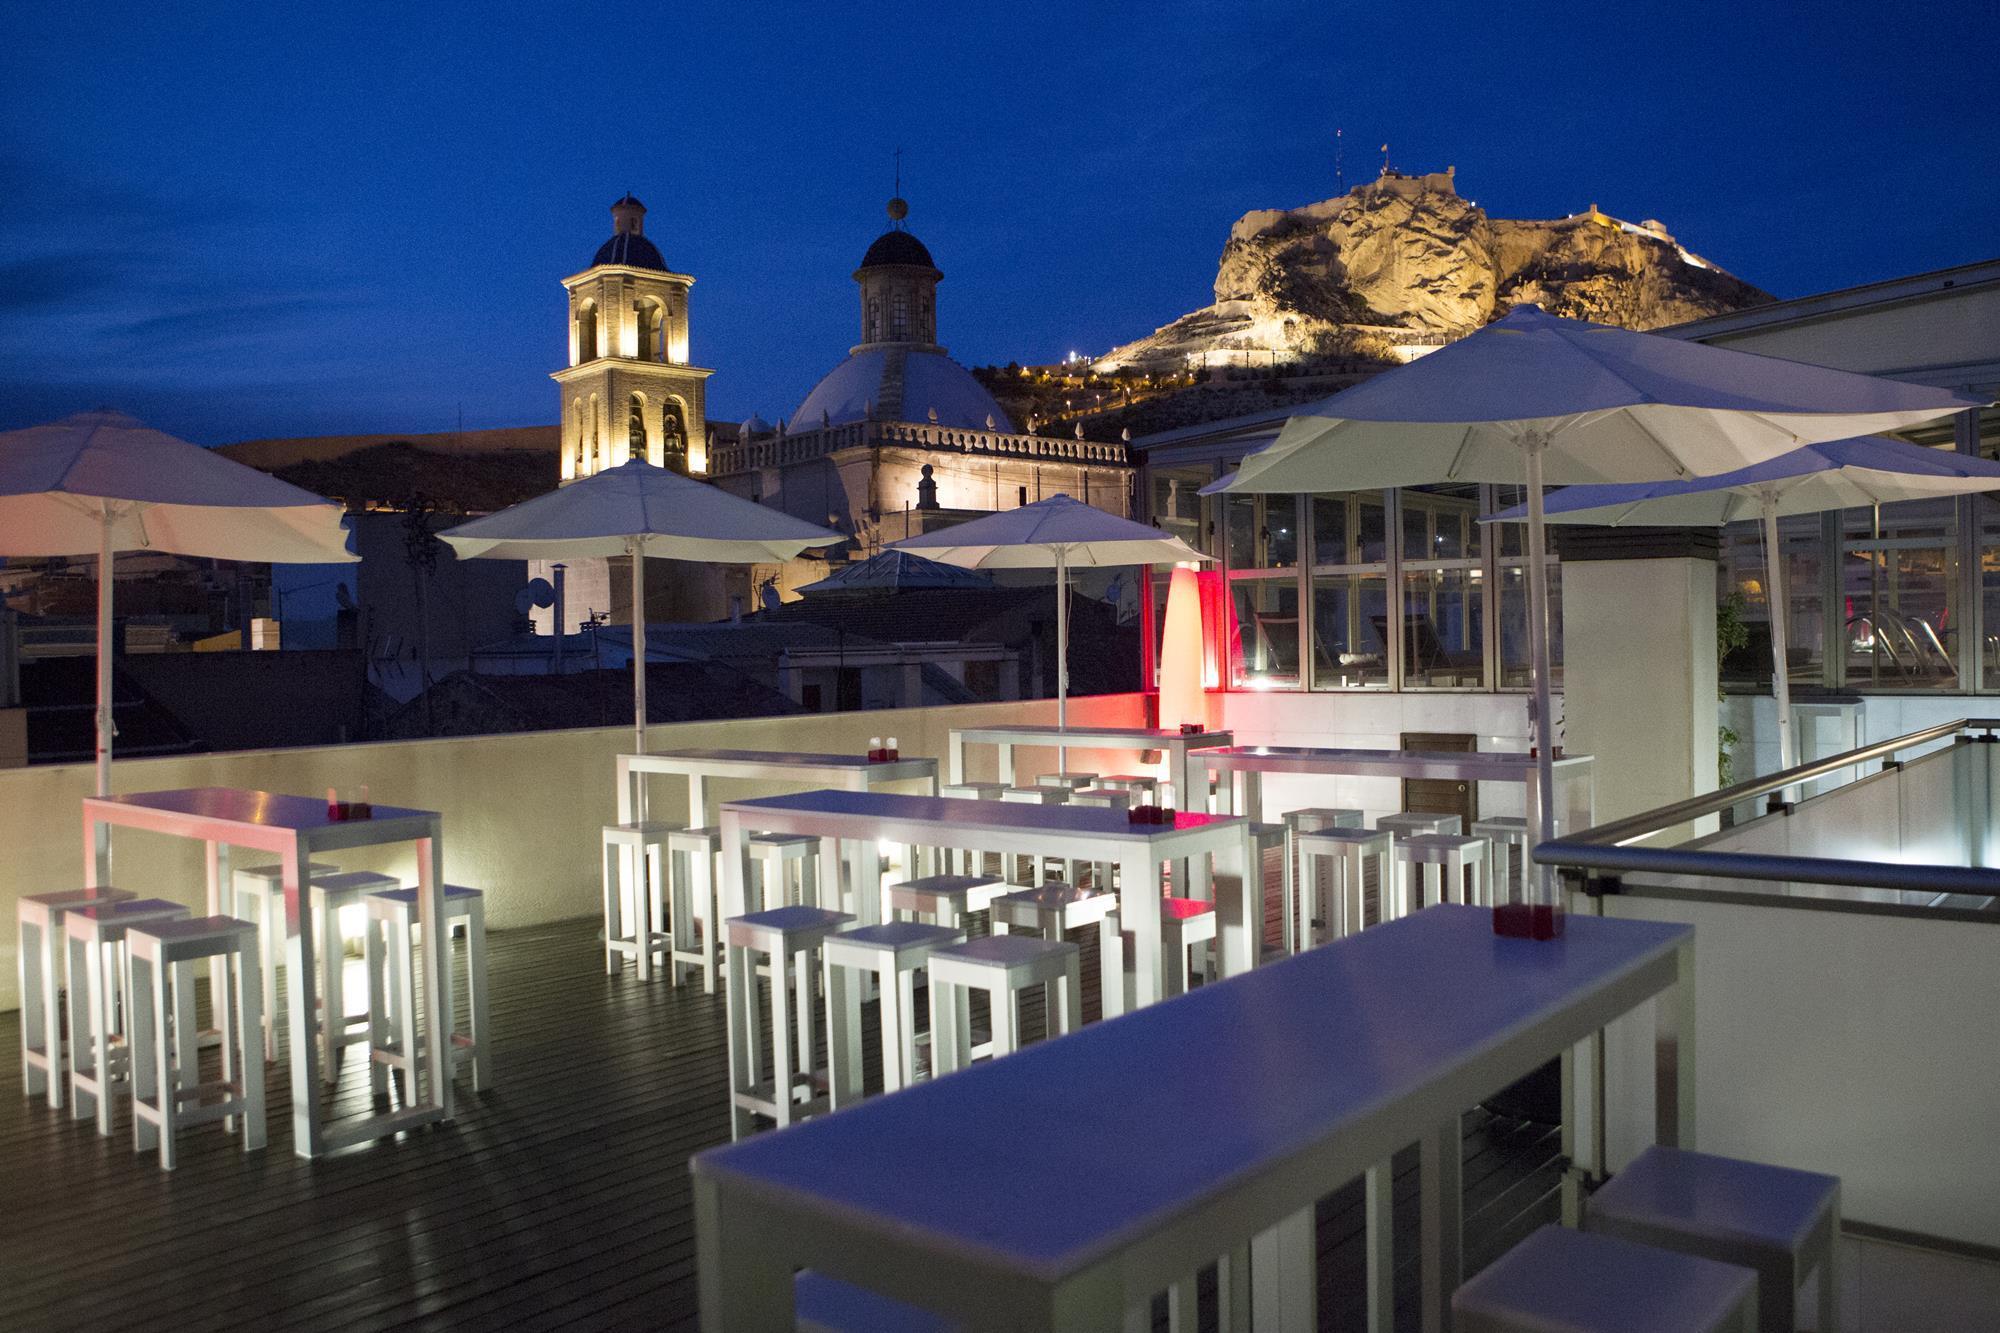 Gaw Capital Enters European Hospitality Market Via Jv With